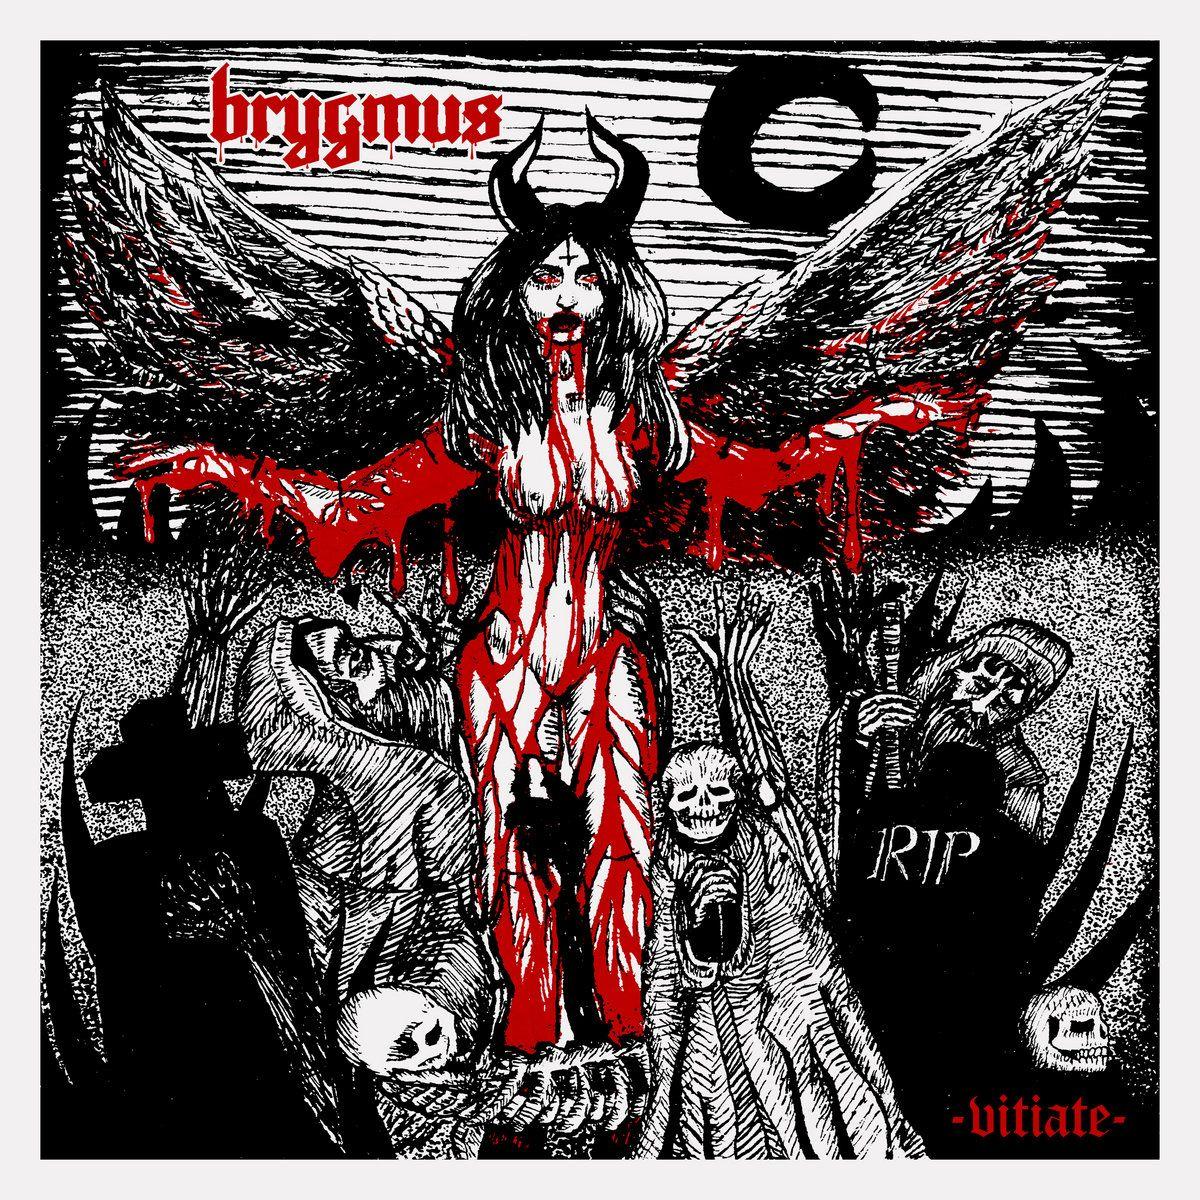 Reviews for Brygmus - Vitiate